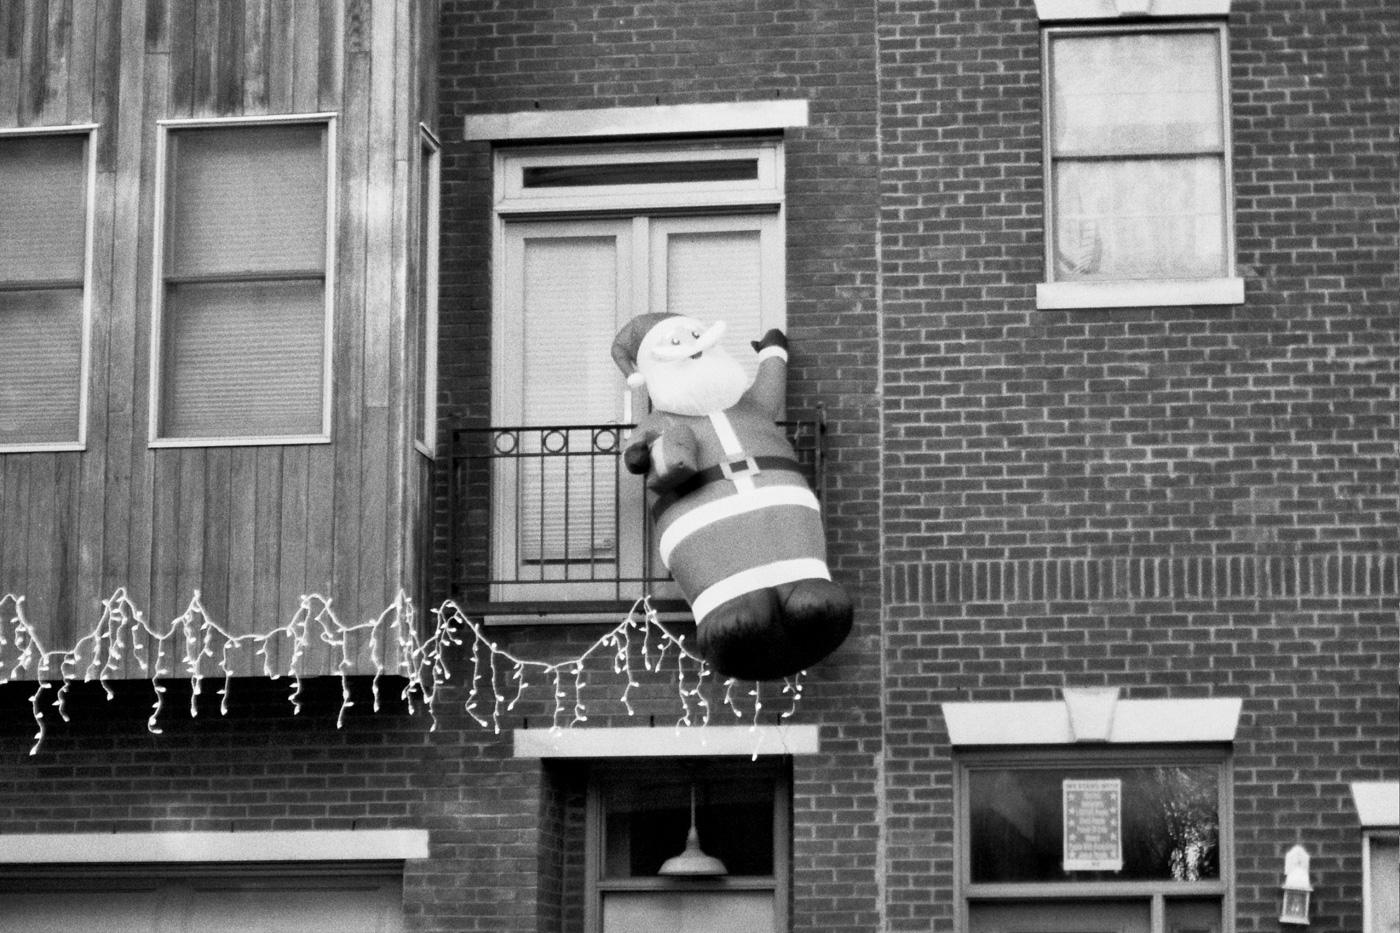 Floating Santa